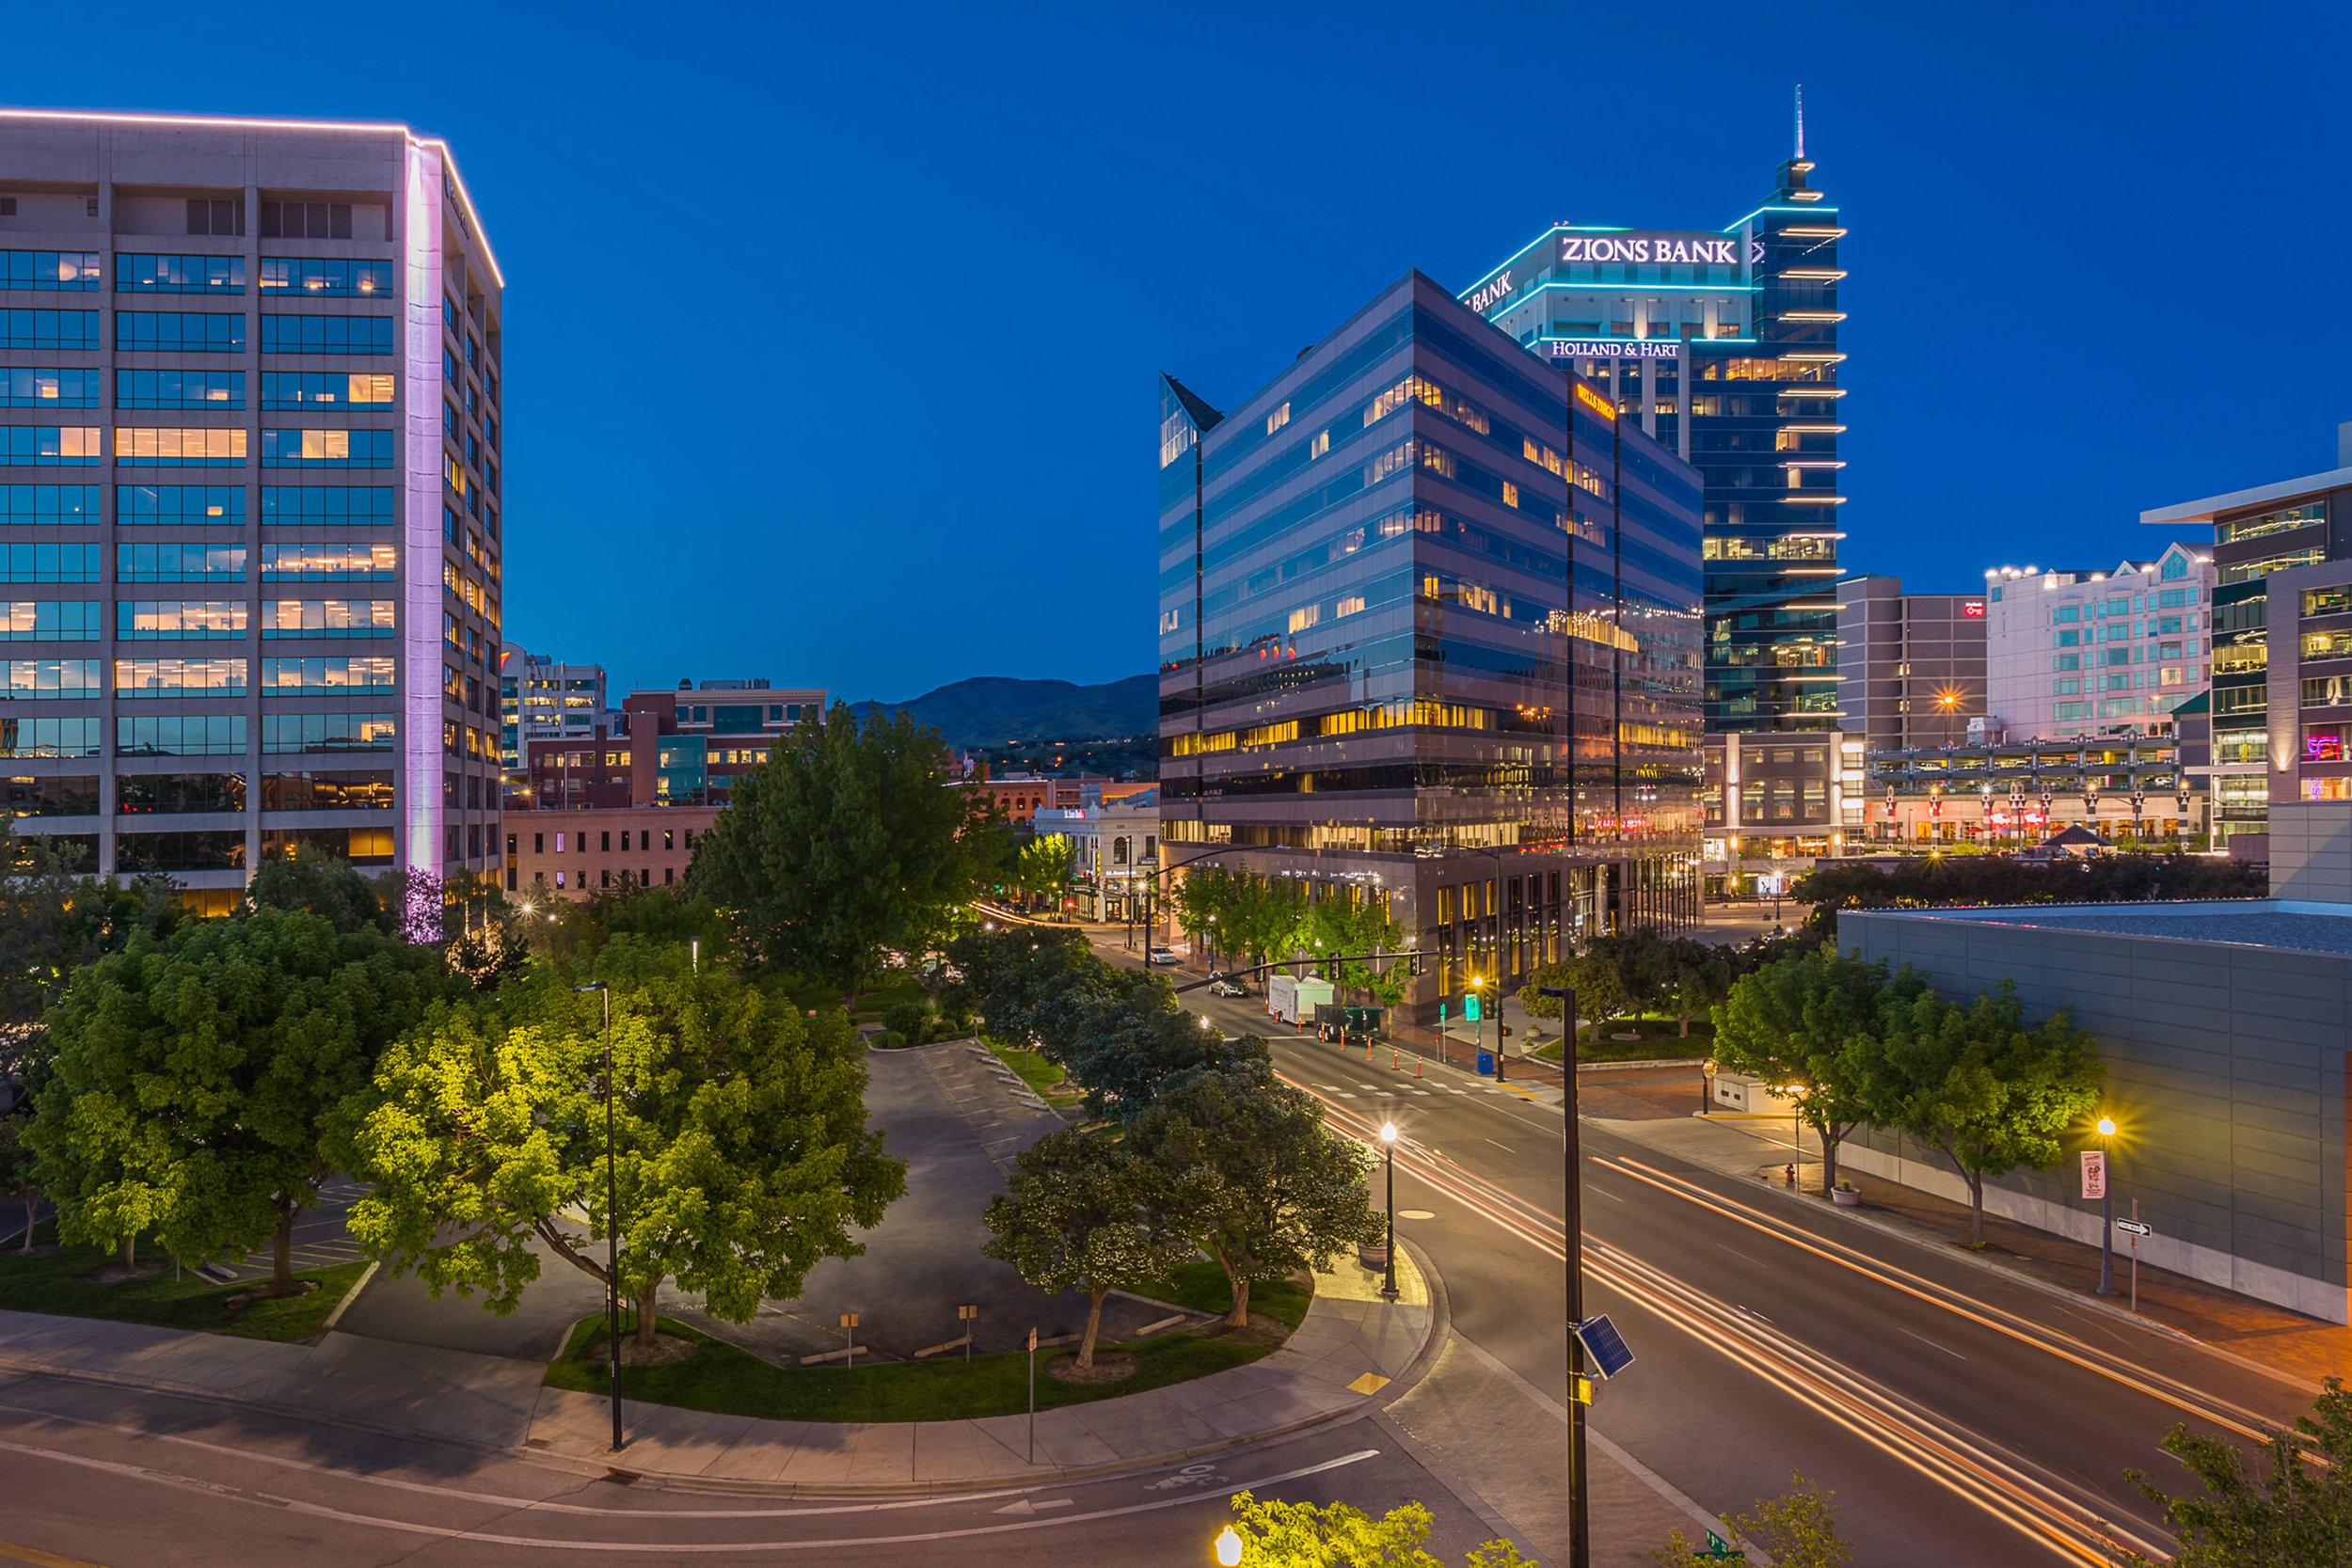 Downtown-070-Edit_x10.jpg